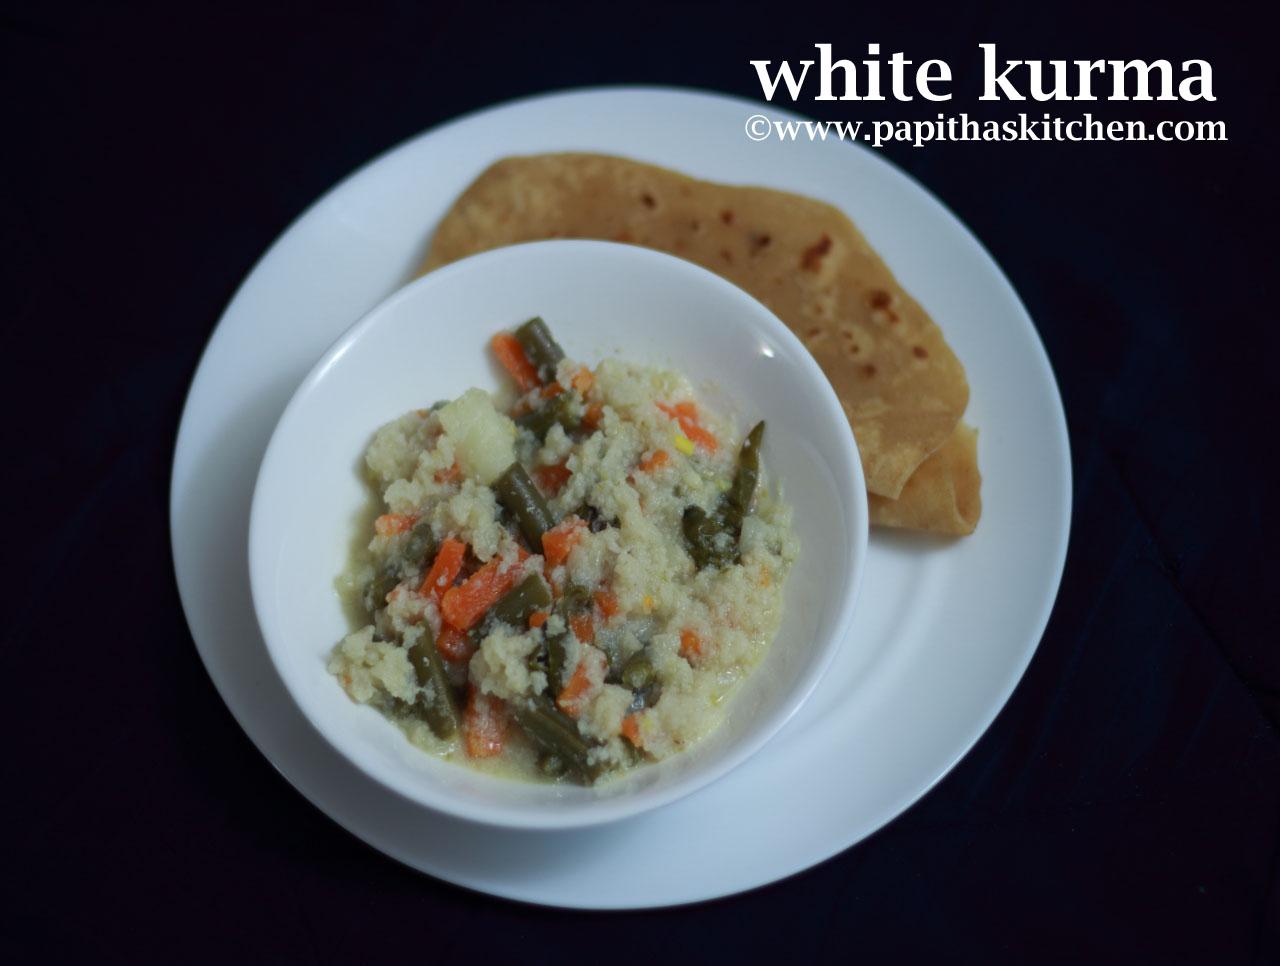 white kurma